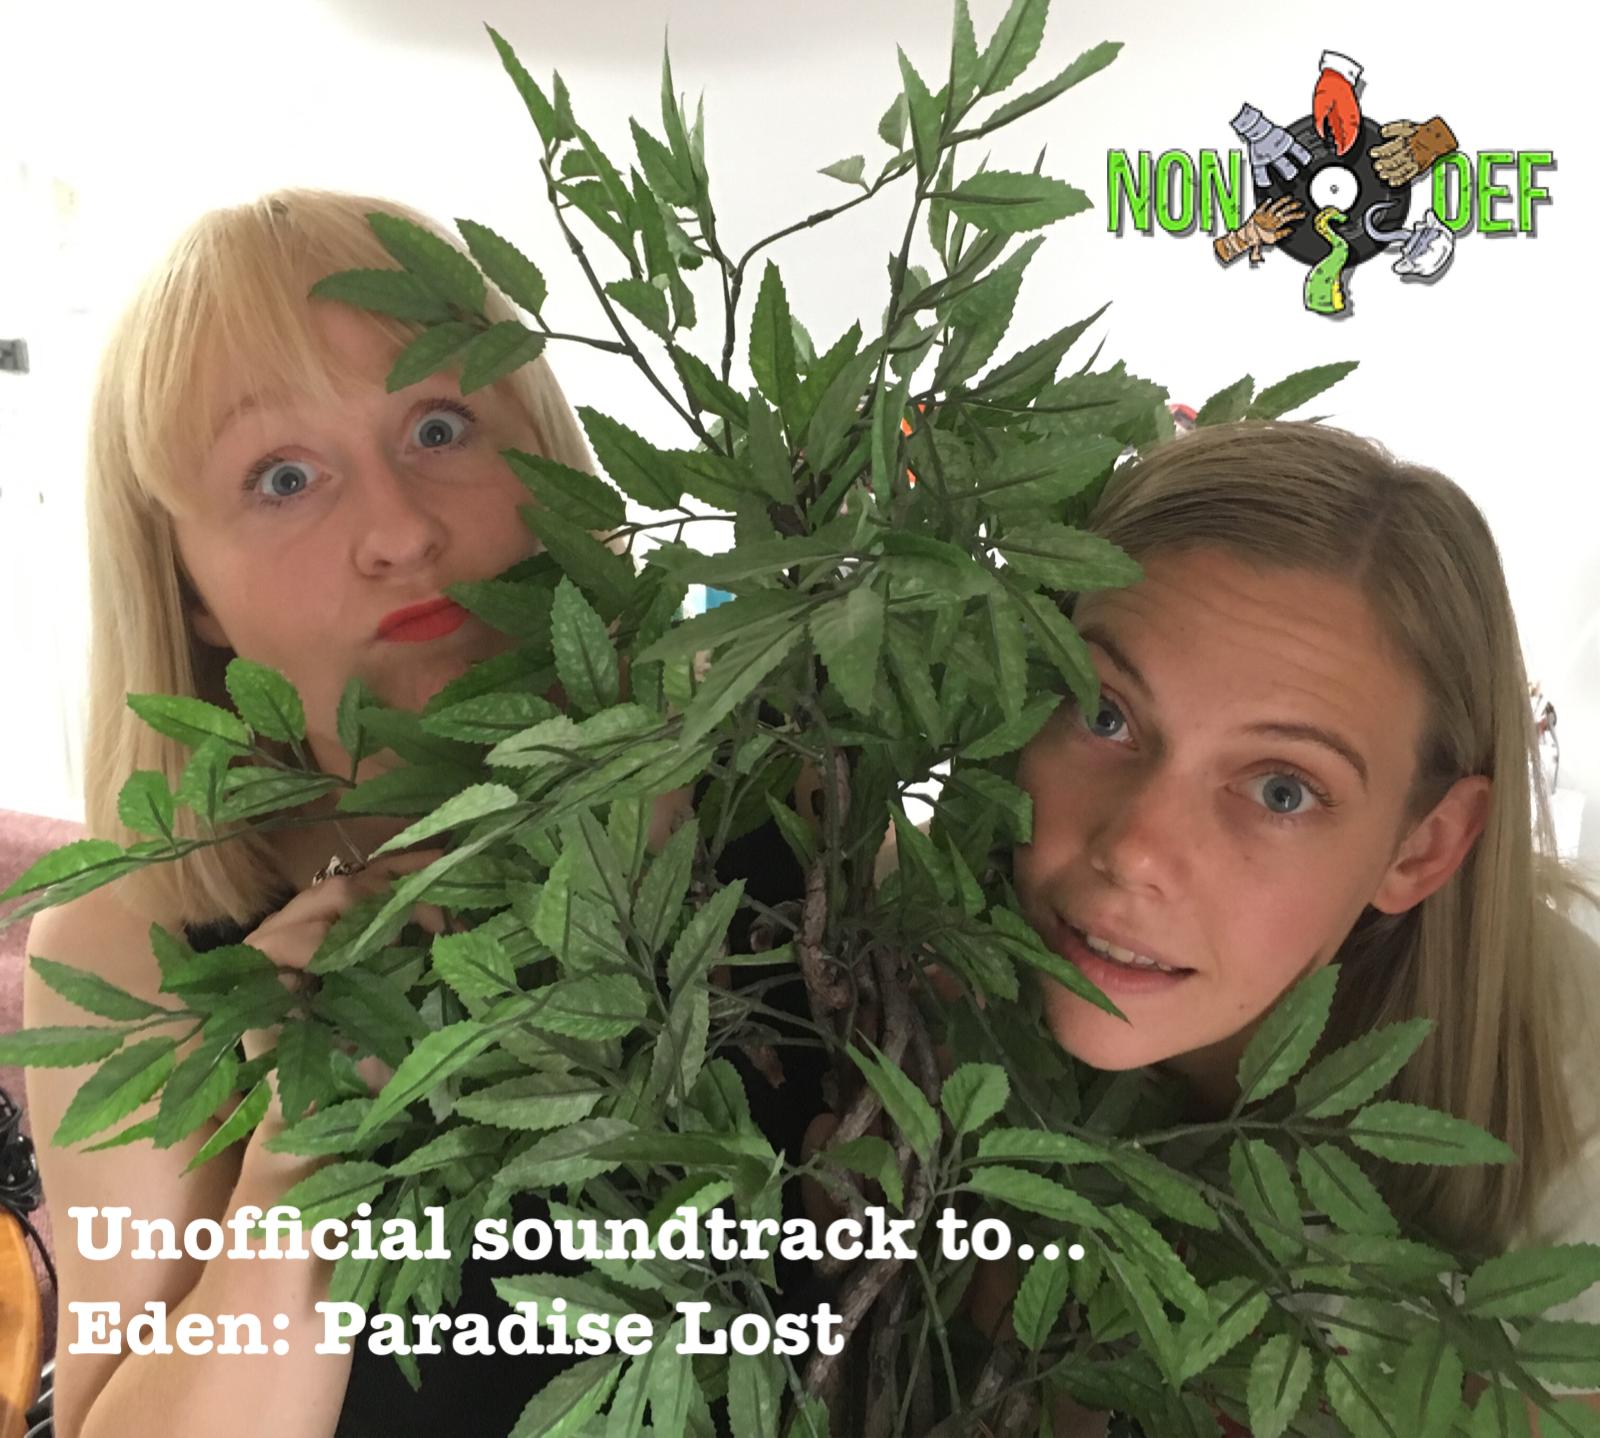 description of eden in paradise lost